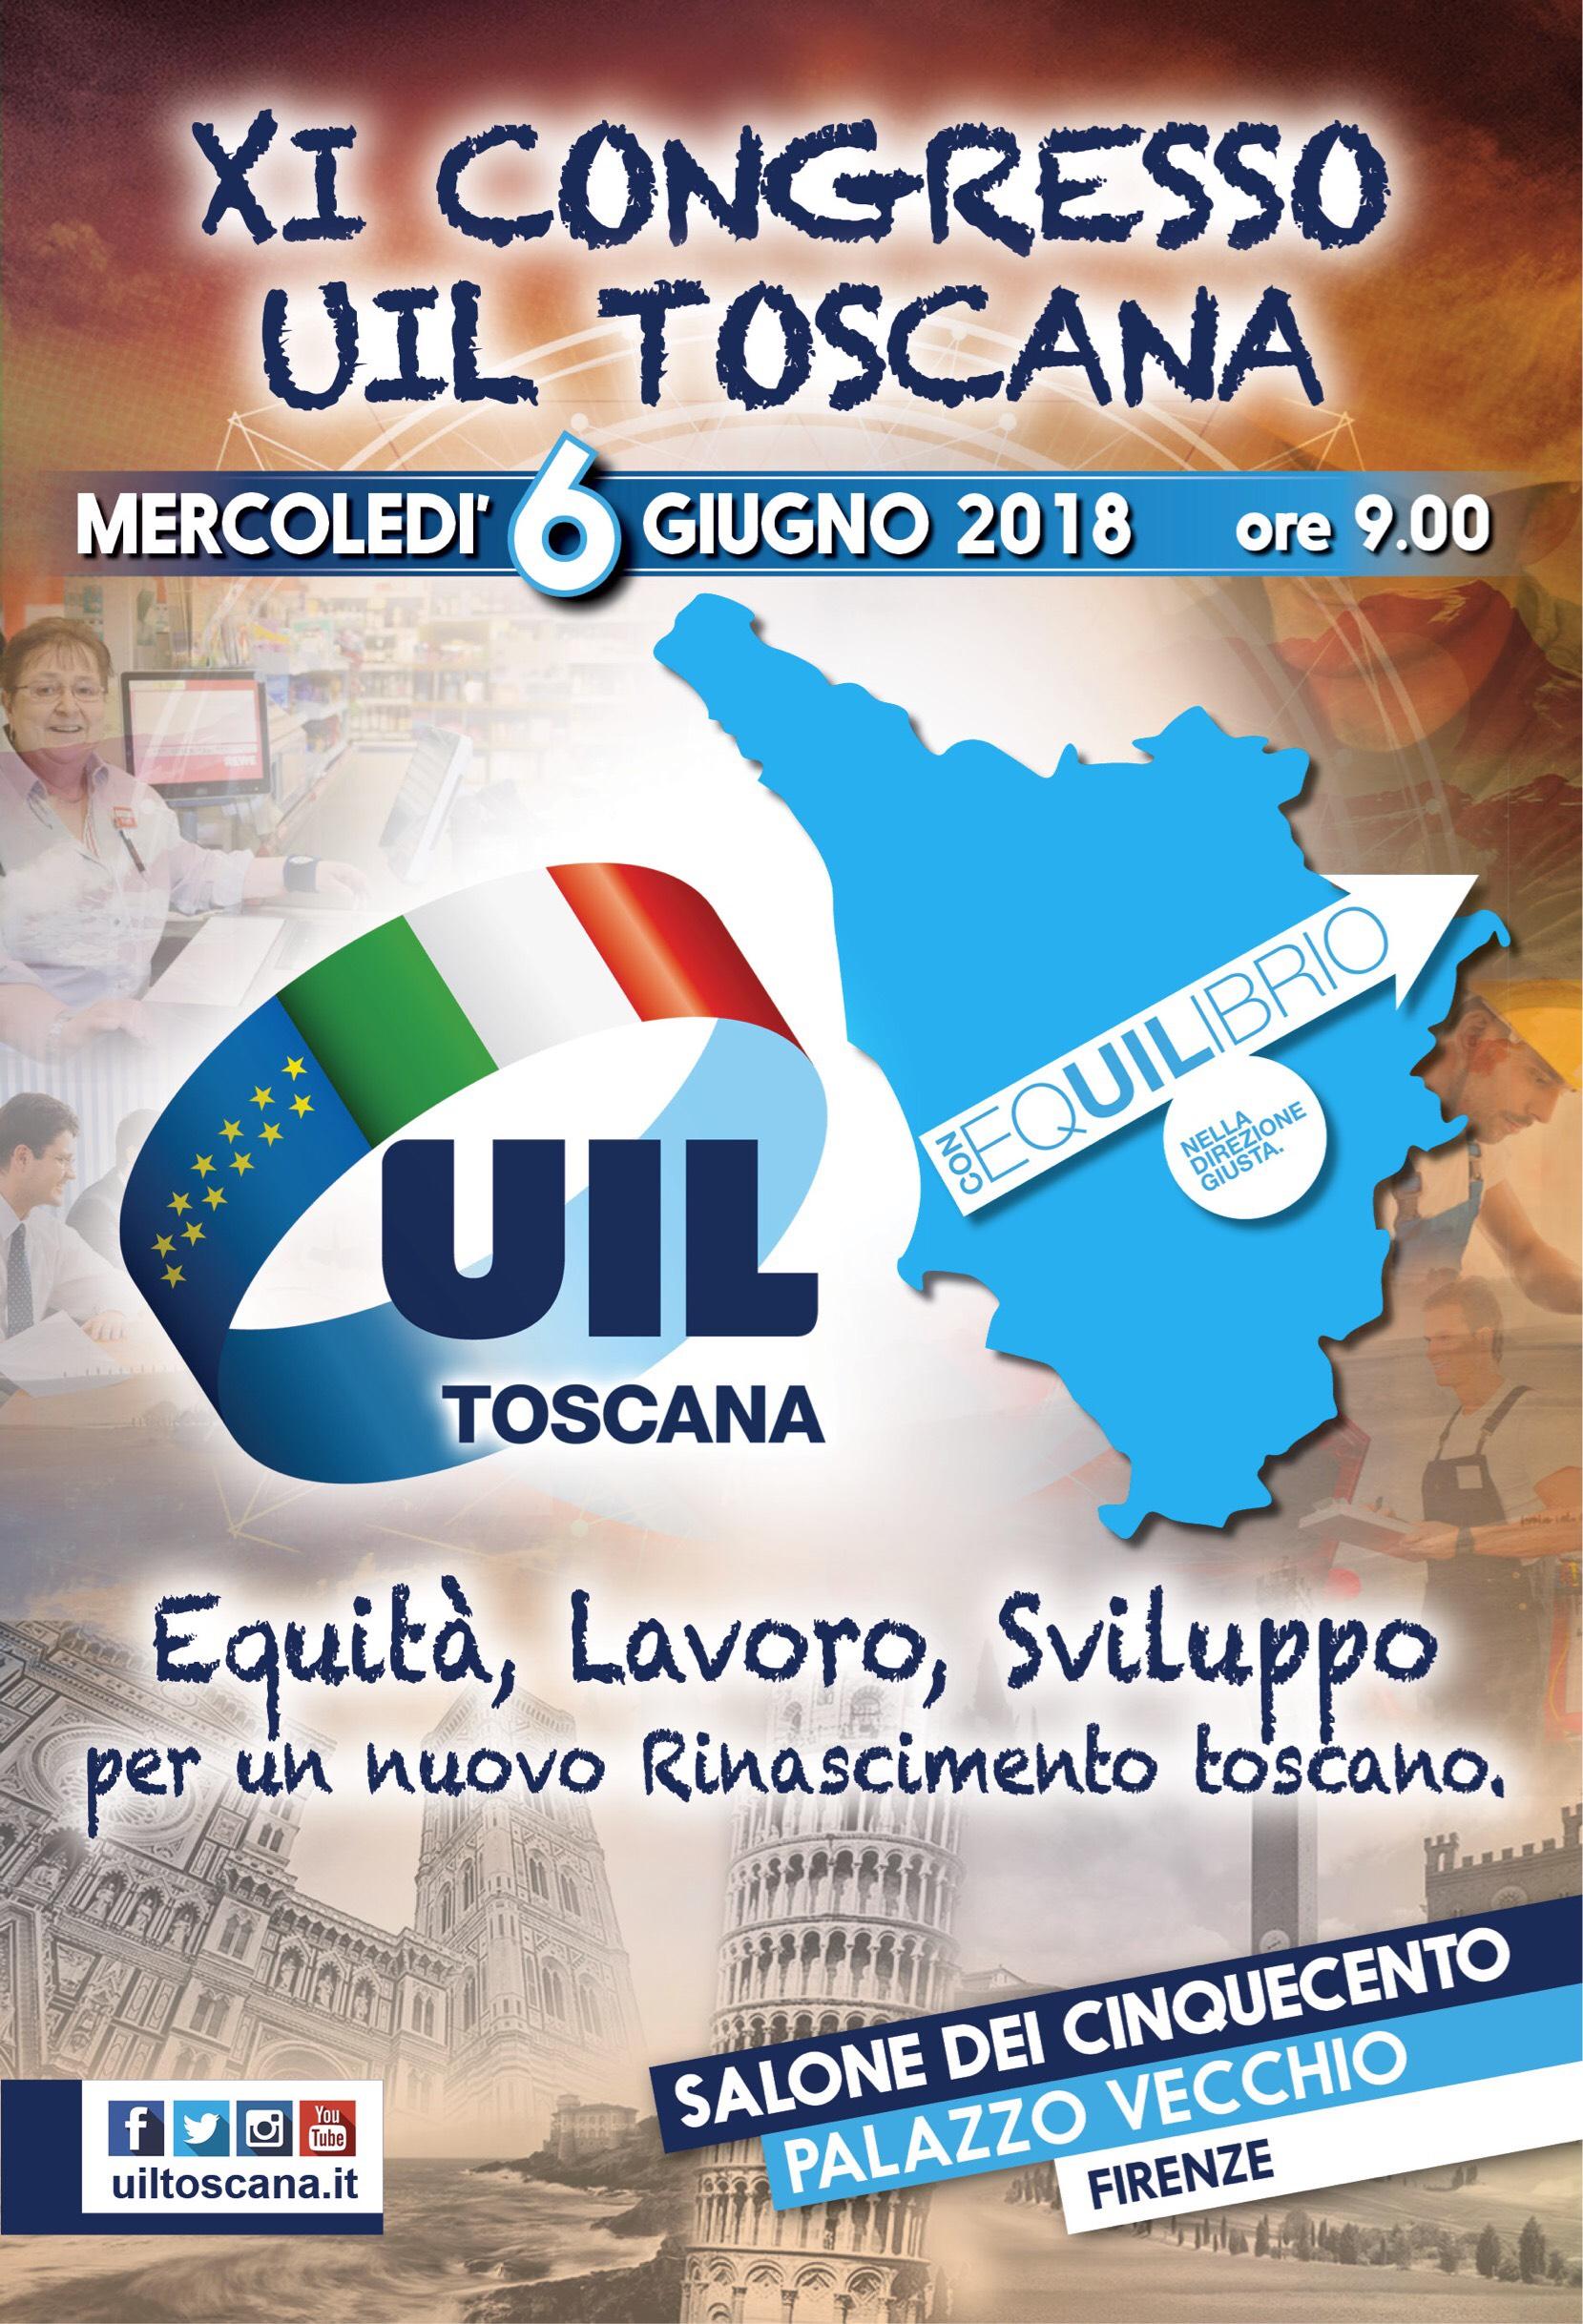 XI Congresso UIL Toscana